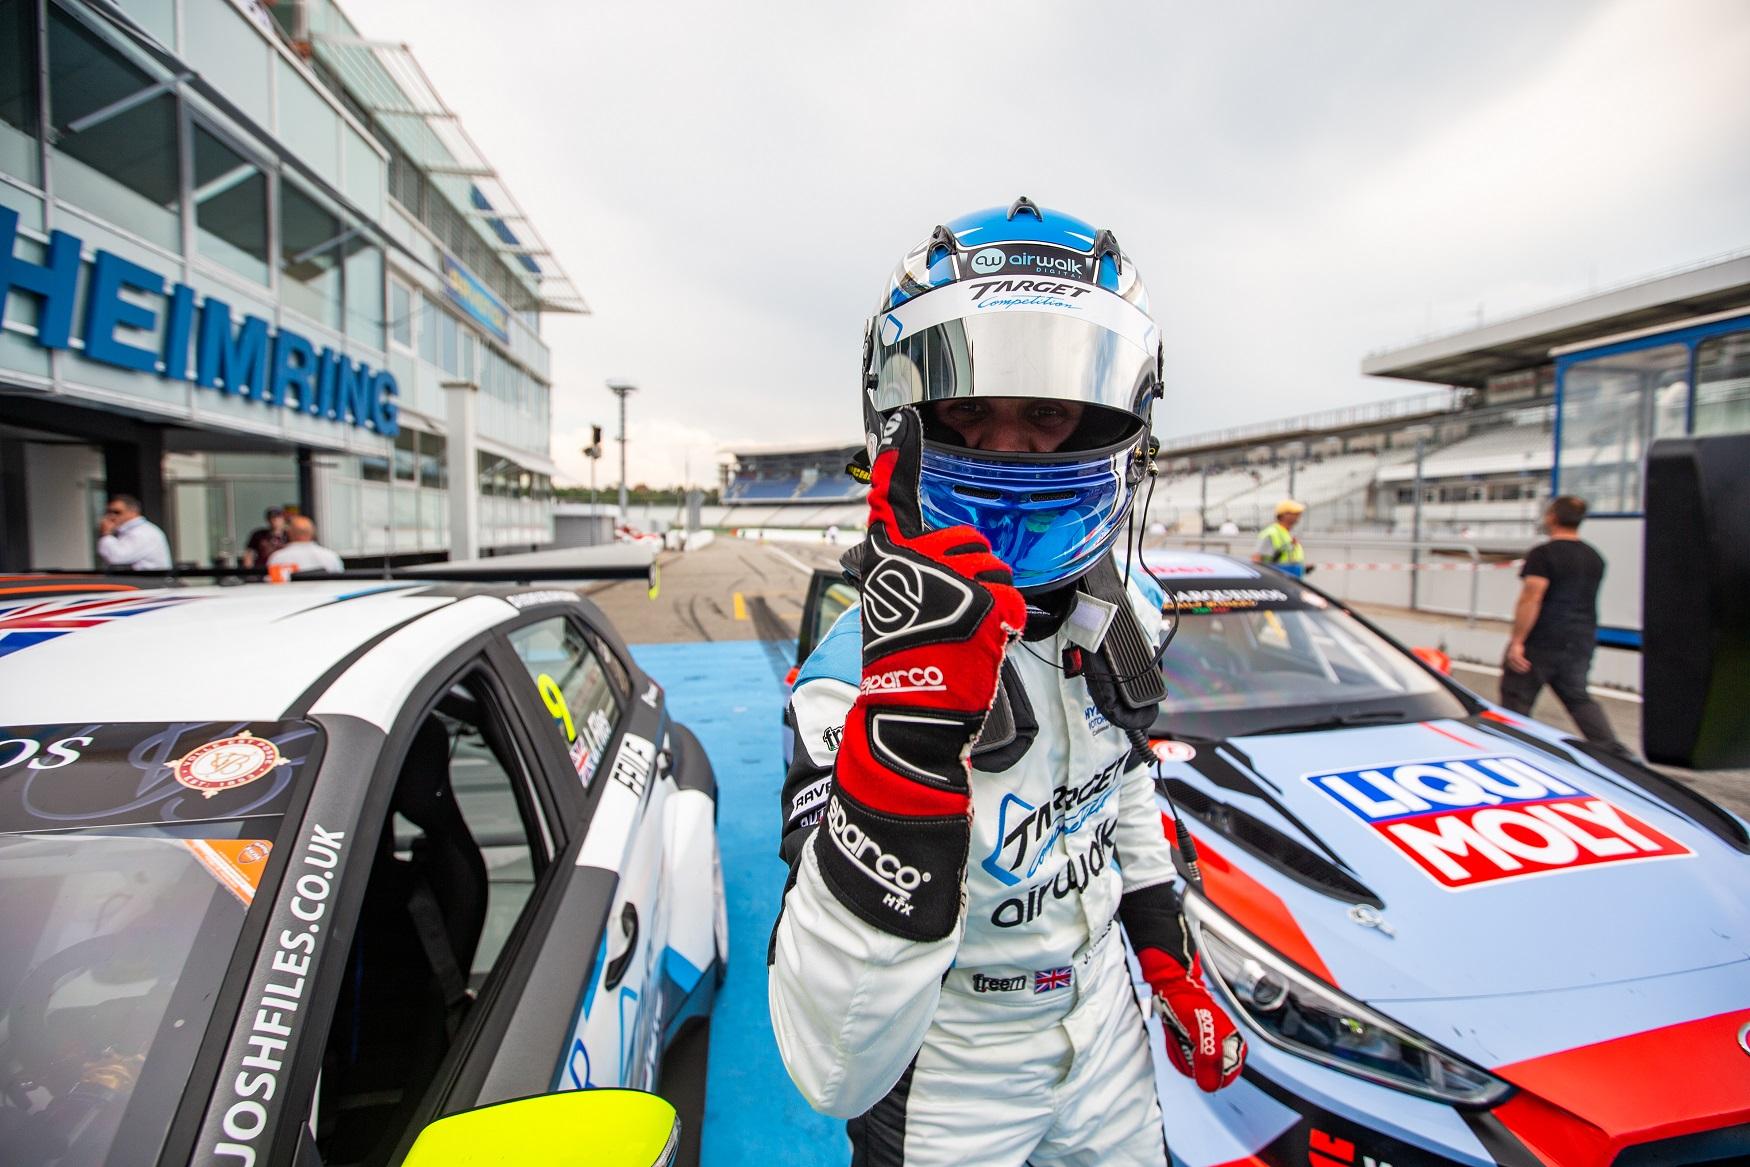 2019-2019 Hockenheim Race 1---2019 EUR Hockenheim Race 1, mini parc ferme_02